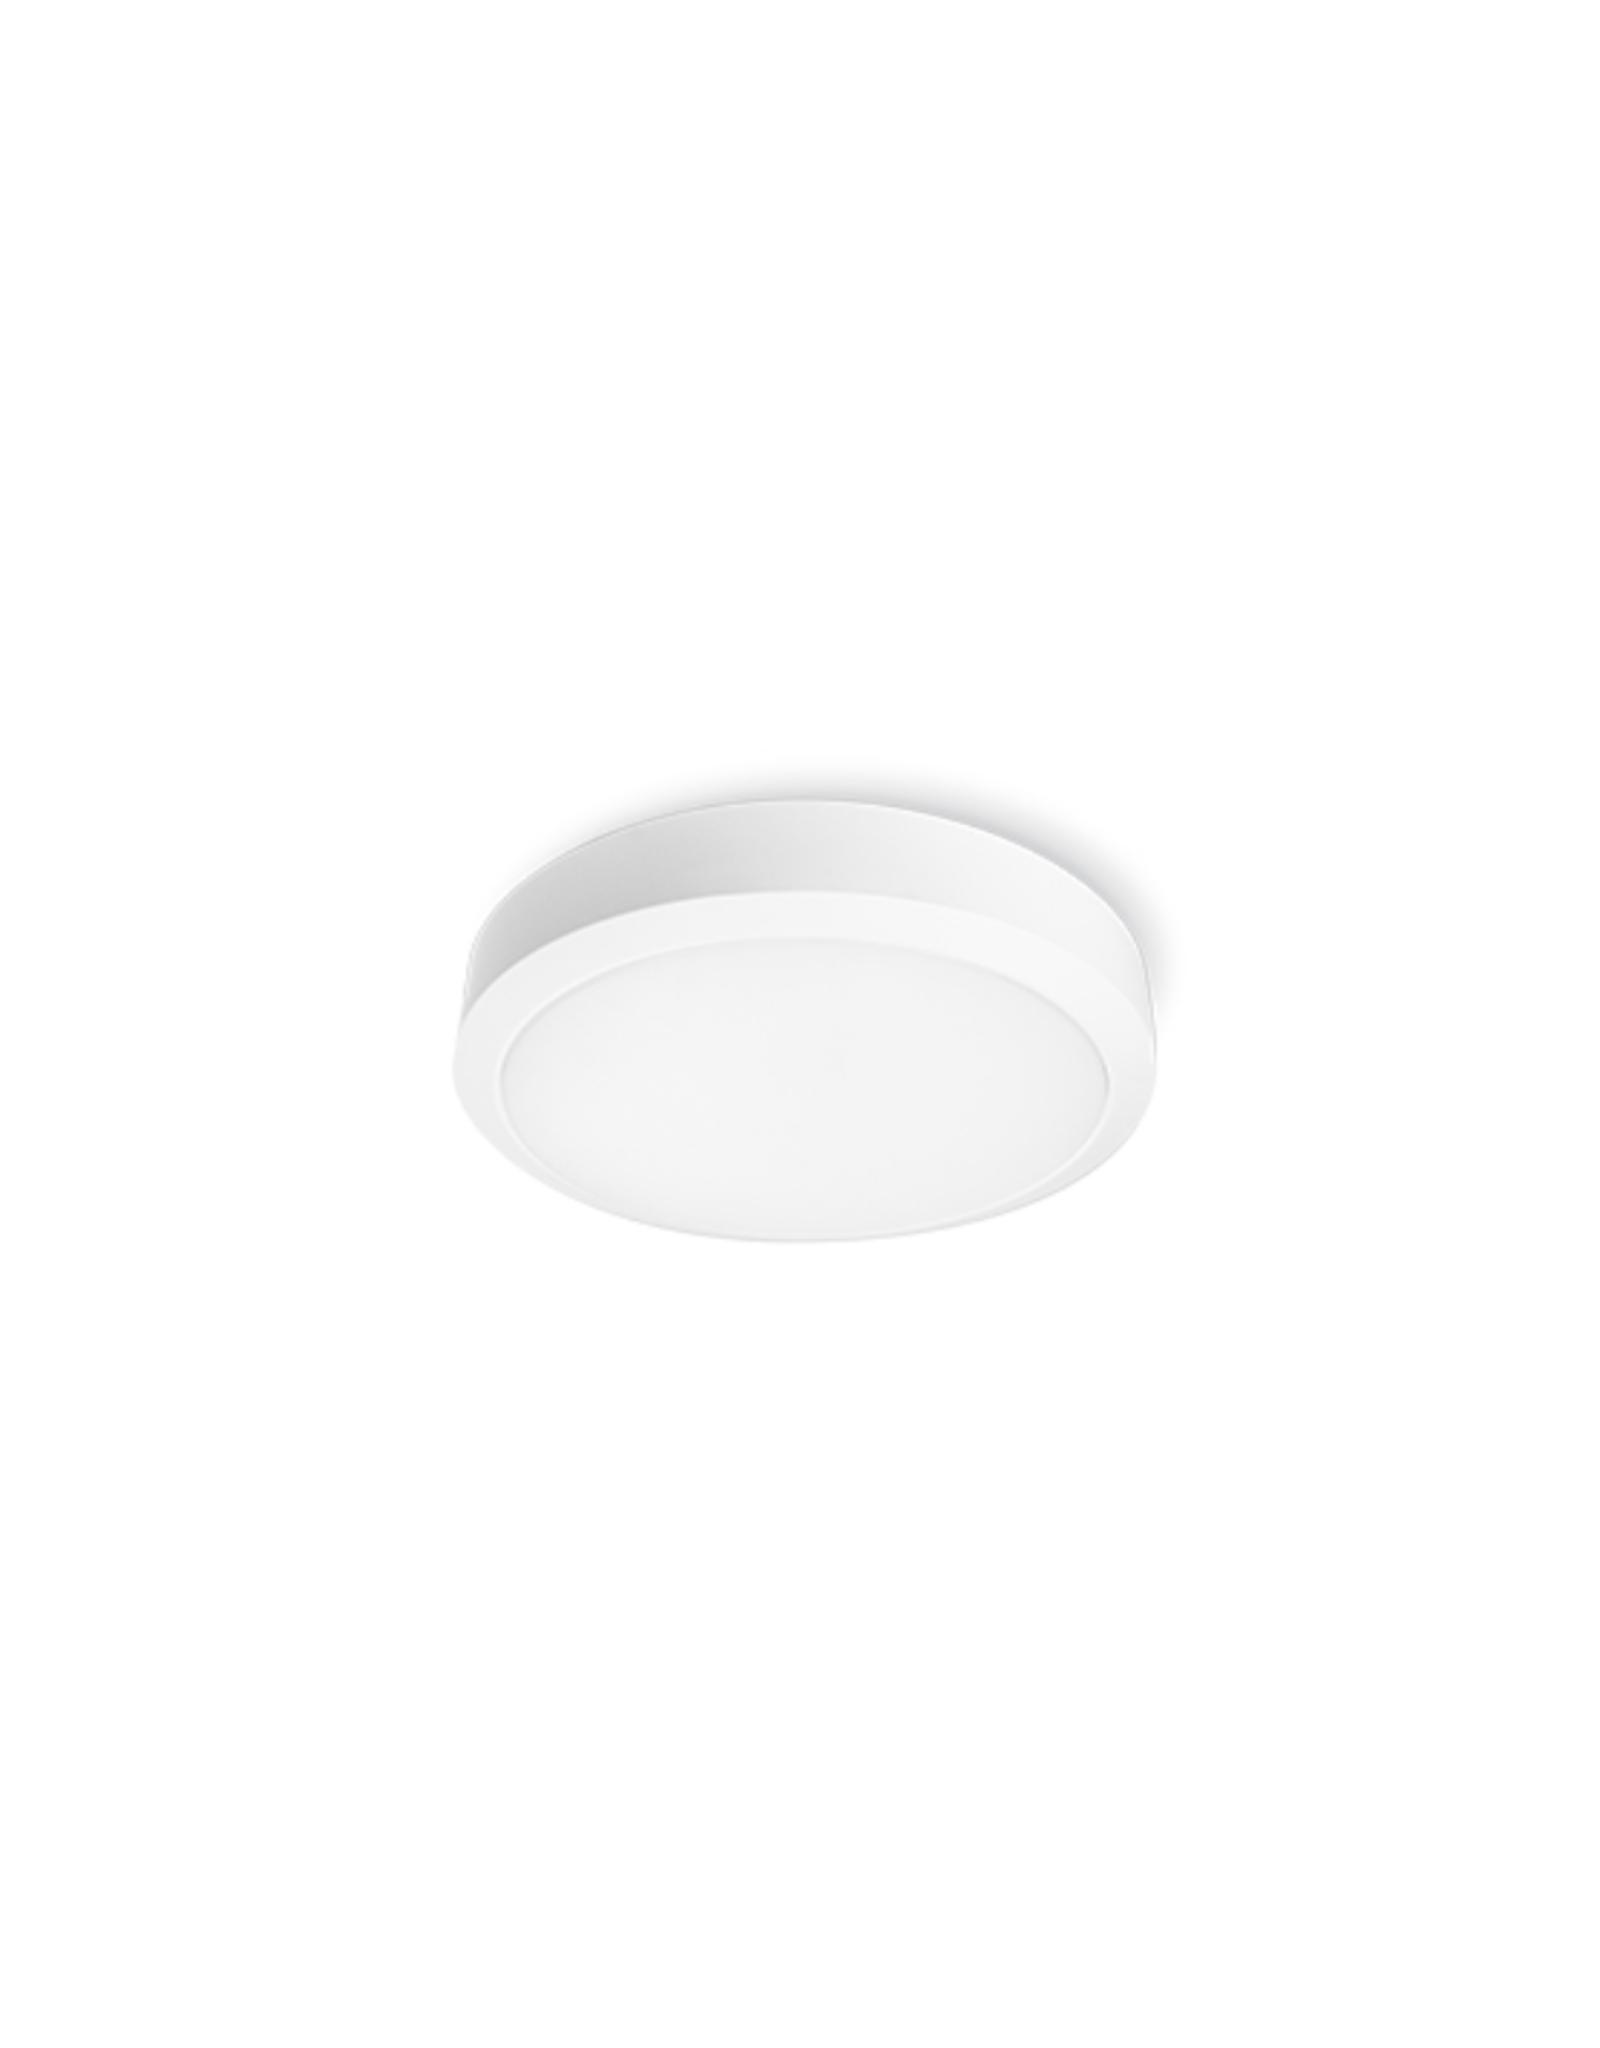 LED plafonniere CLX+ - 3000k/4000k - 14,5W